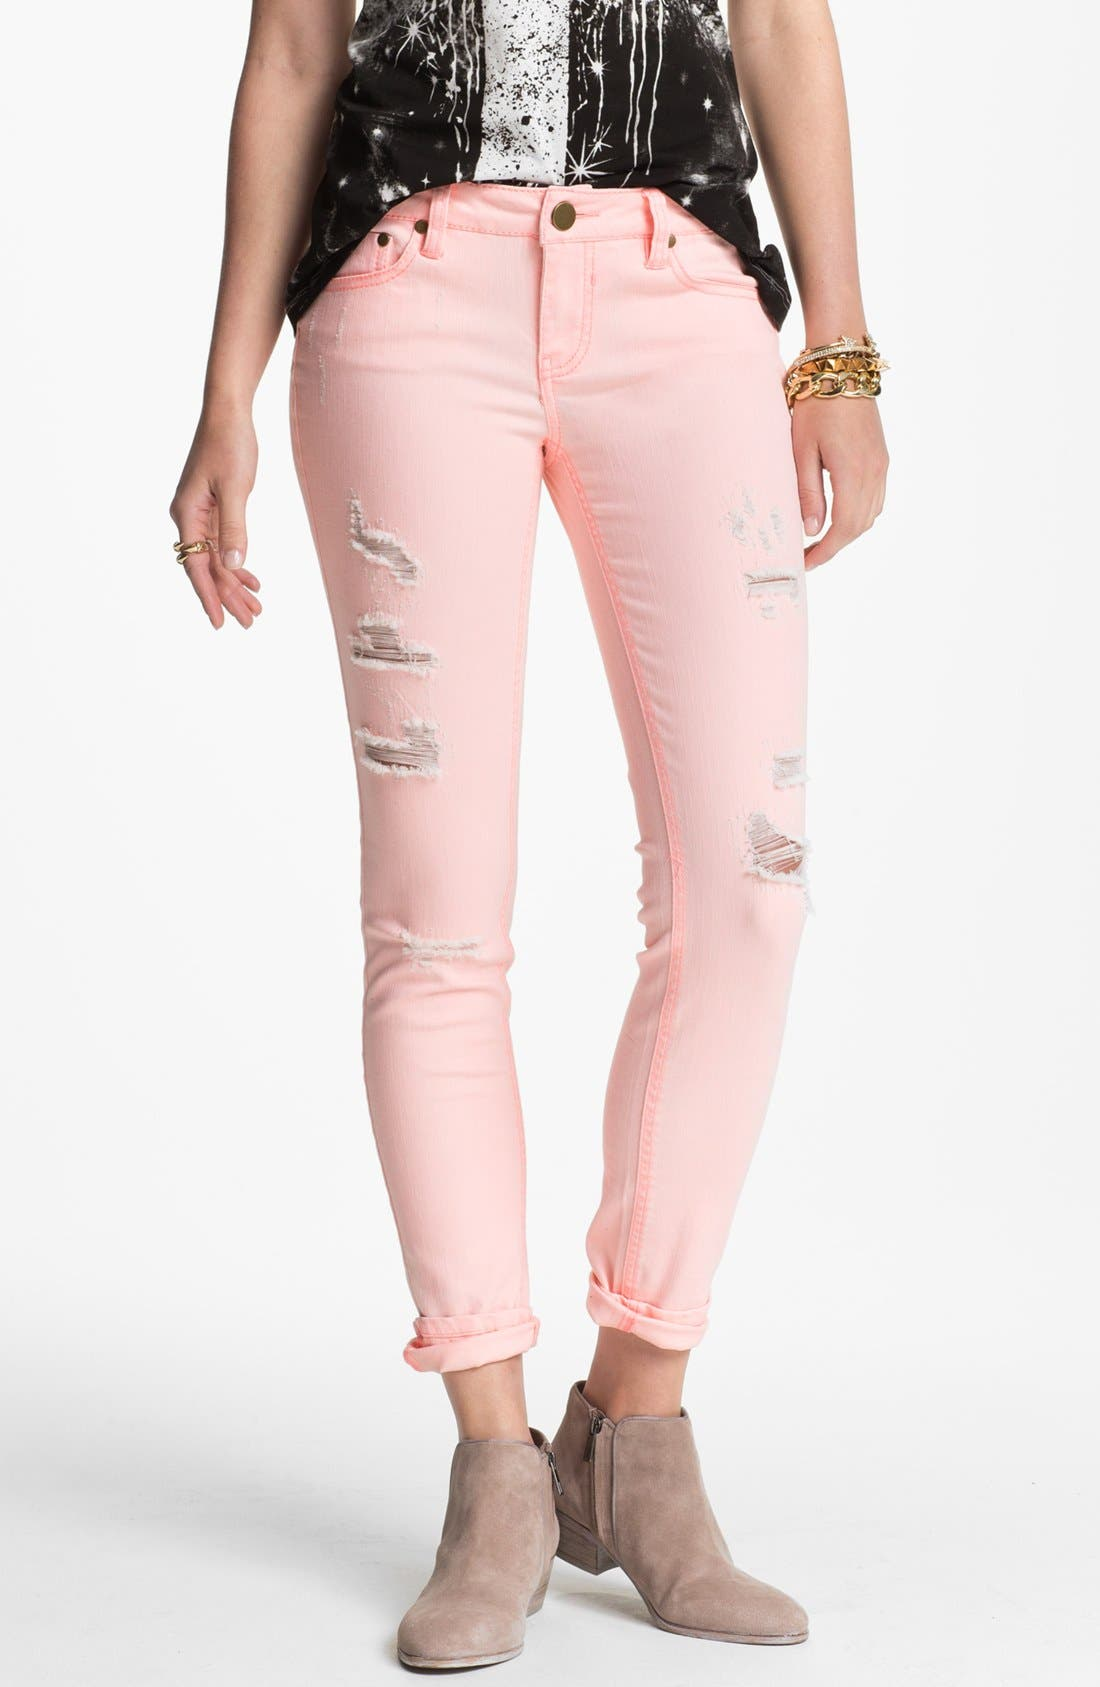 Alternate Image 1 Selected - Fire Destroyed Pastel Denim Skinny Jeans (Juniors) (Online Only)